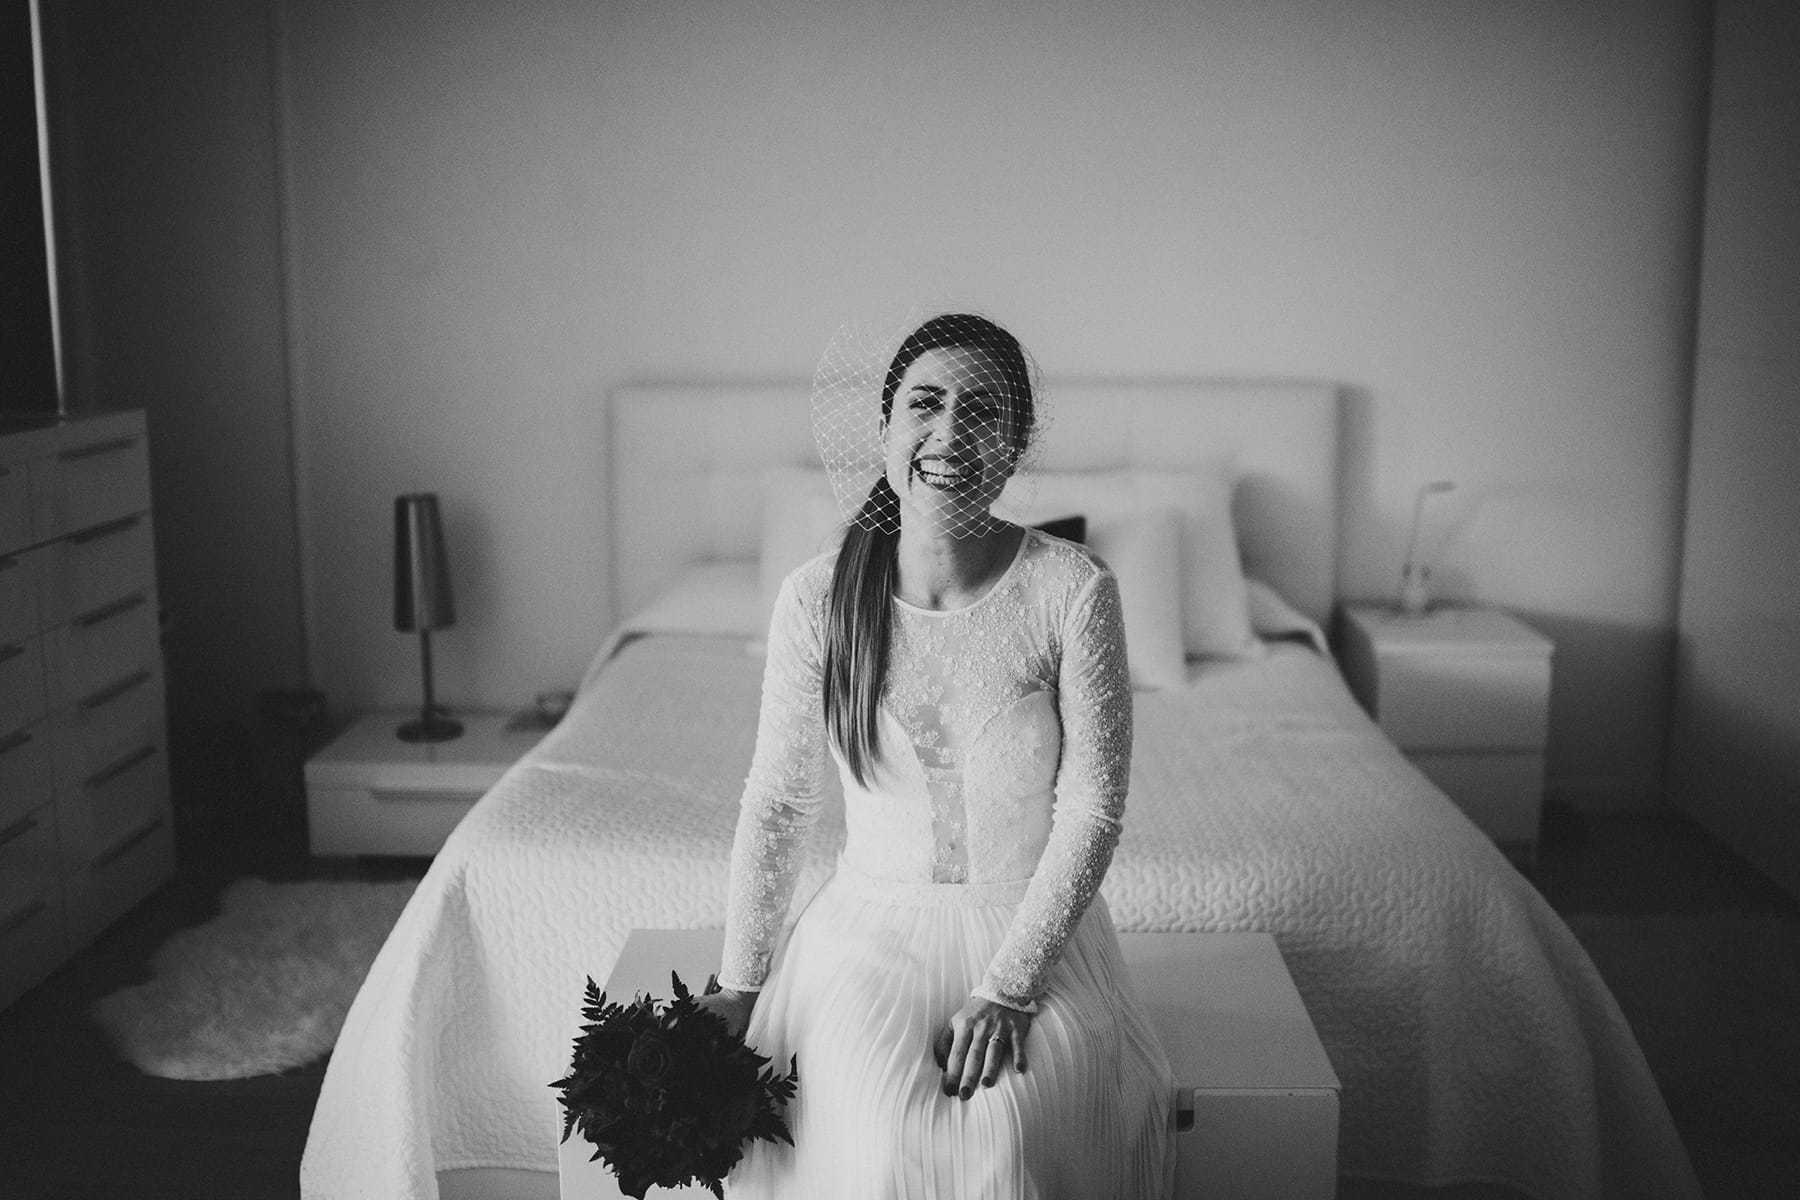 vestido_de_novia_otaduy_hilario_sanchez_fotografo_boda_barcelona_044